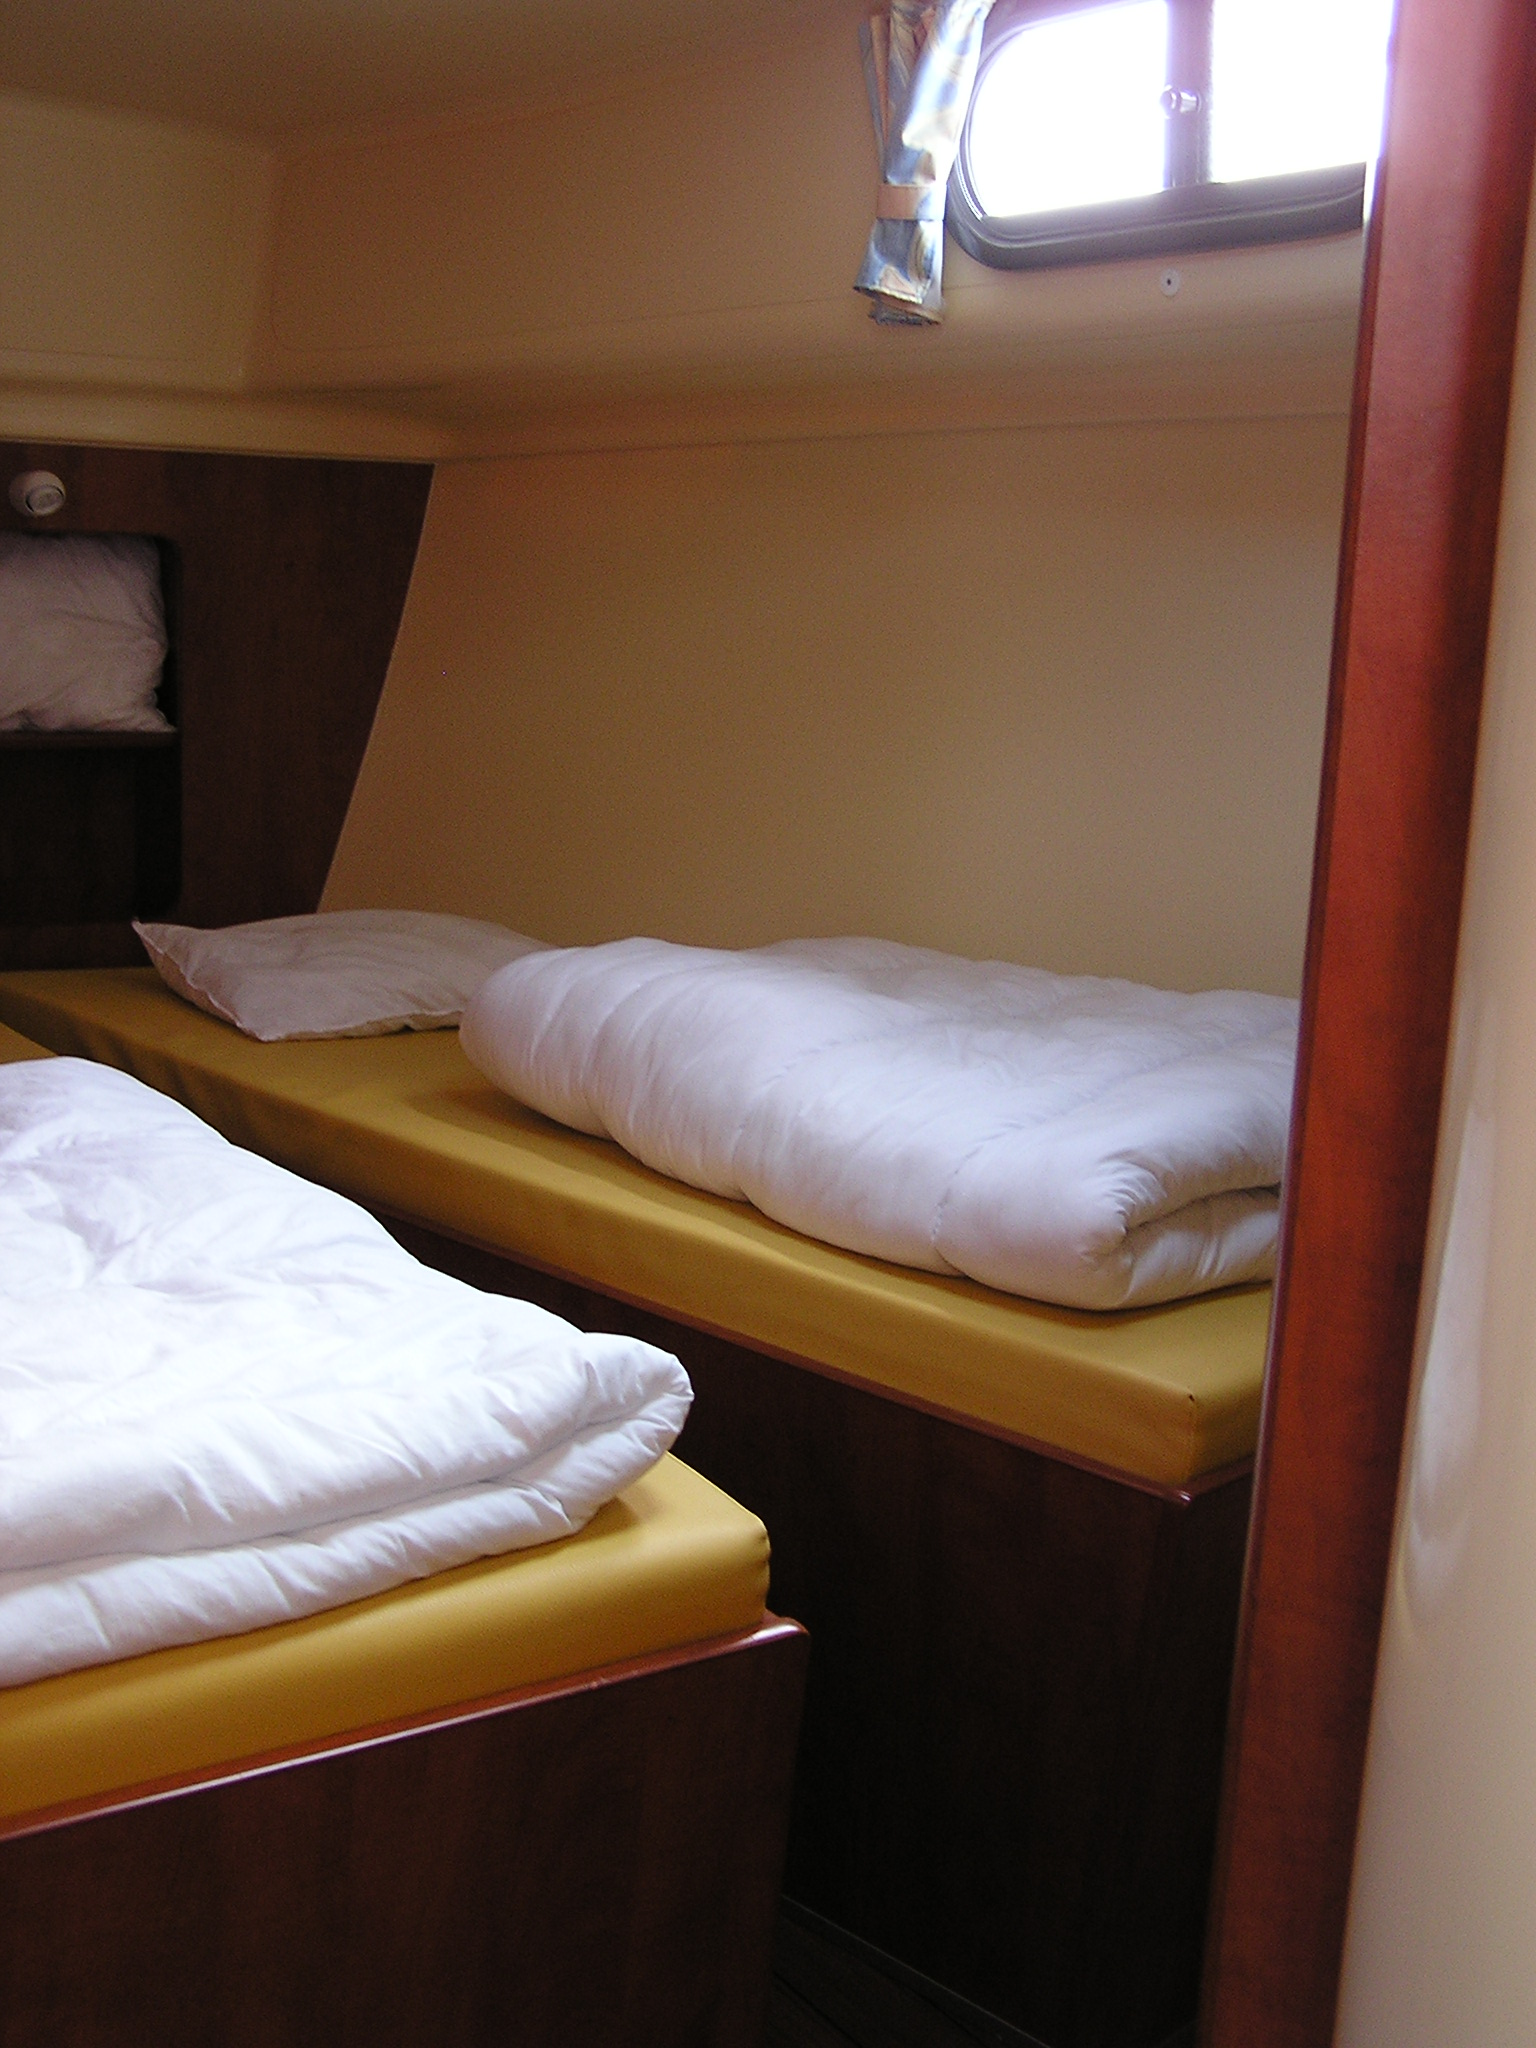 Nicols Estivale QUATTRO chambre lits simples sireuil charente inter croisieres